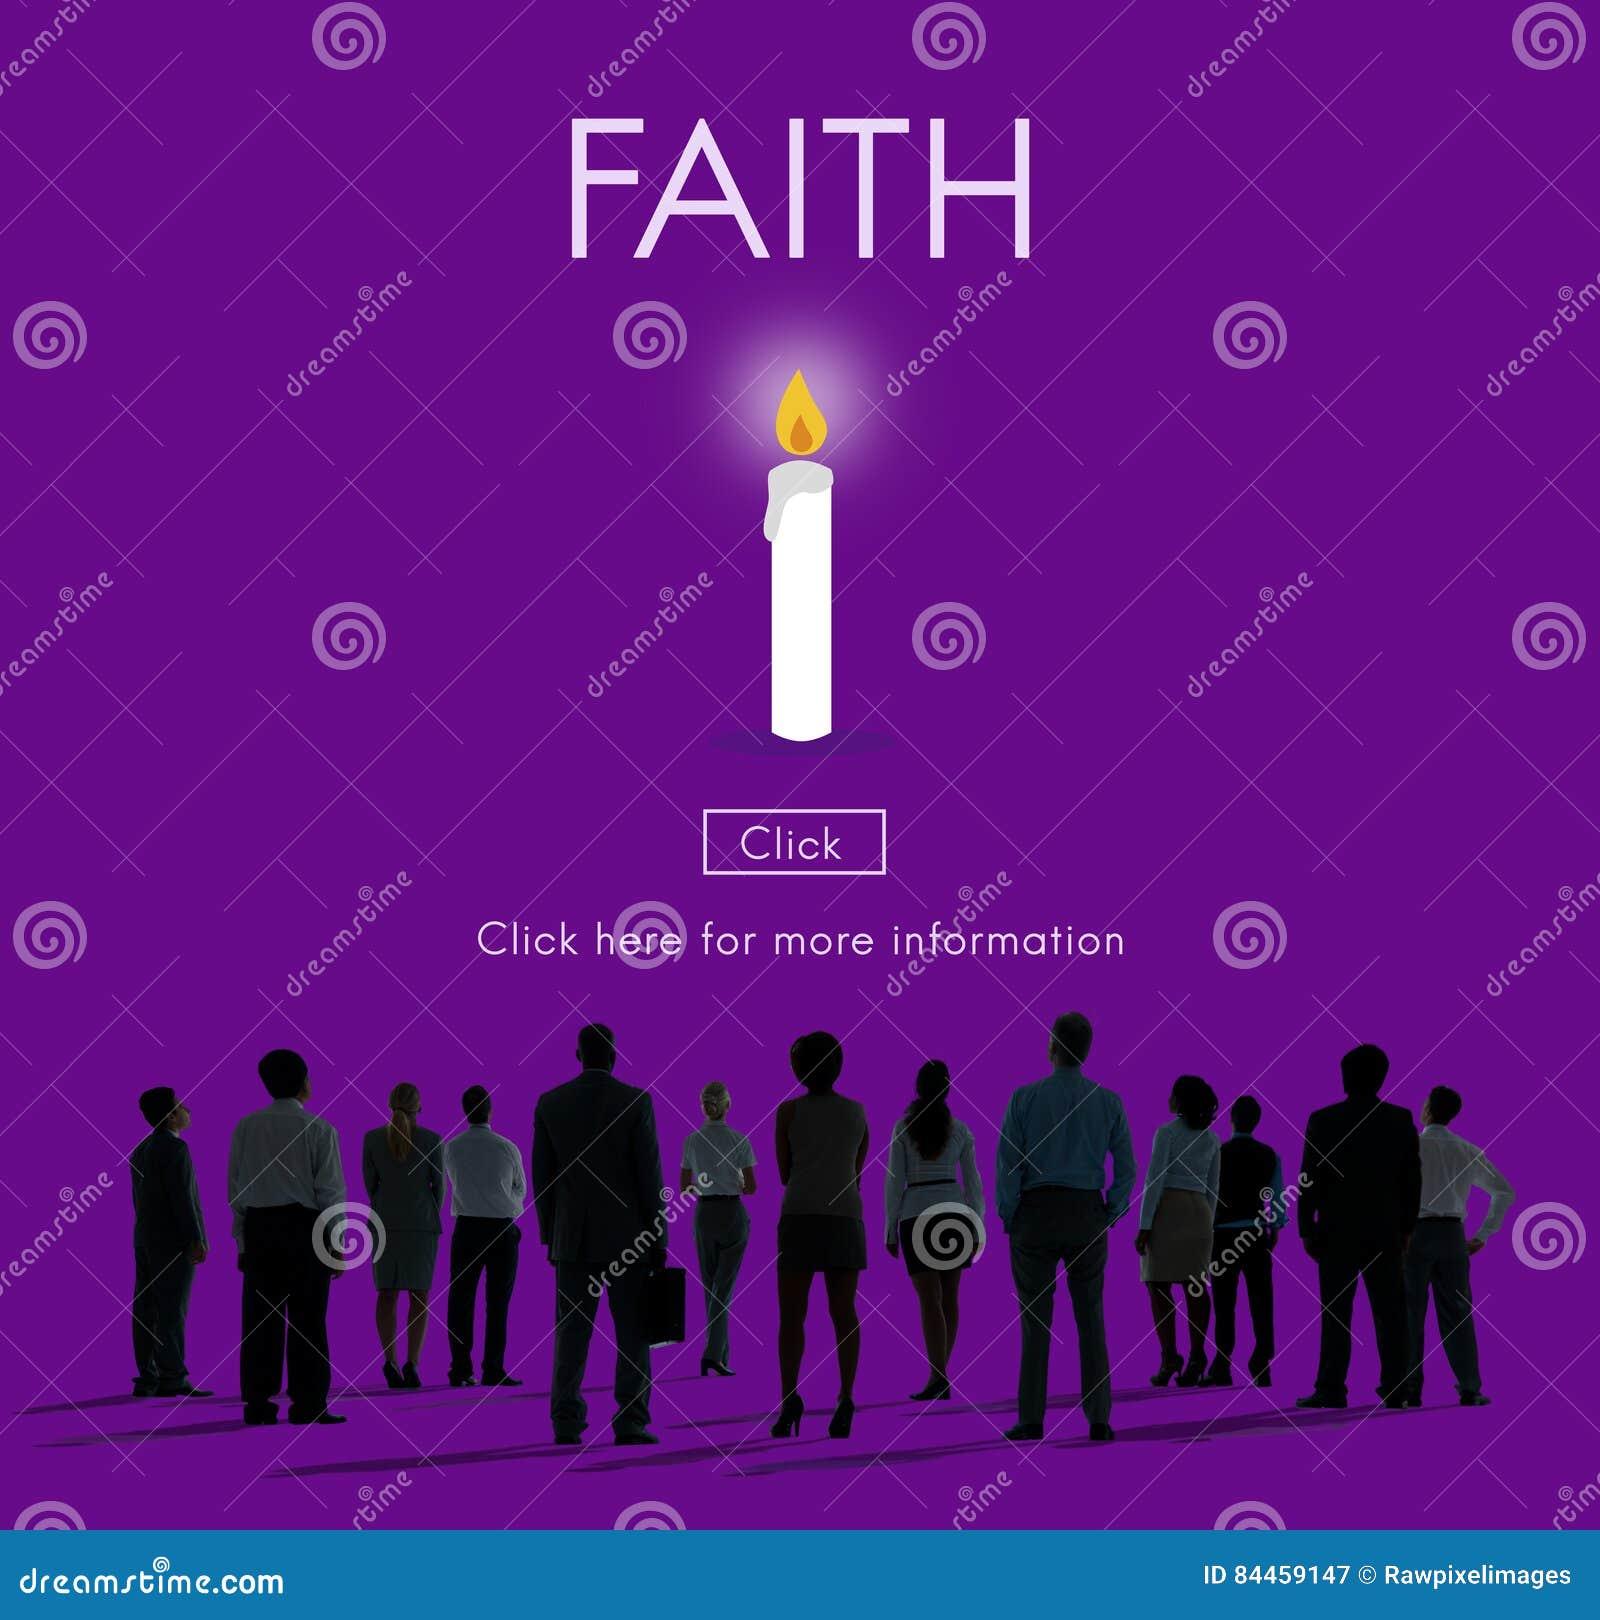 Faith Hope Ideology Loyalty Religion Belief Believe Concept